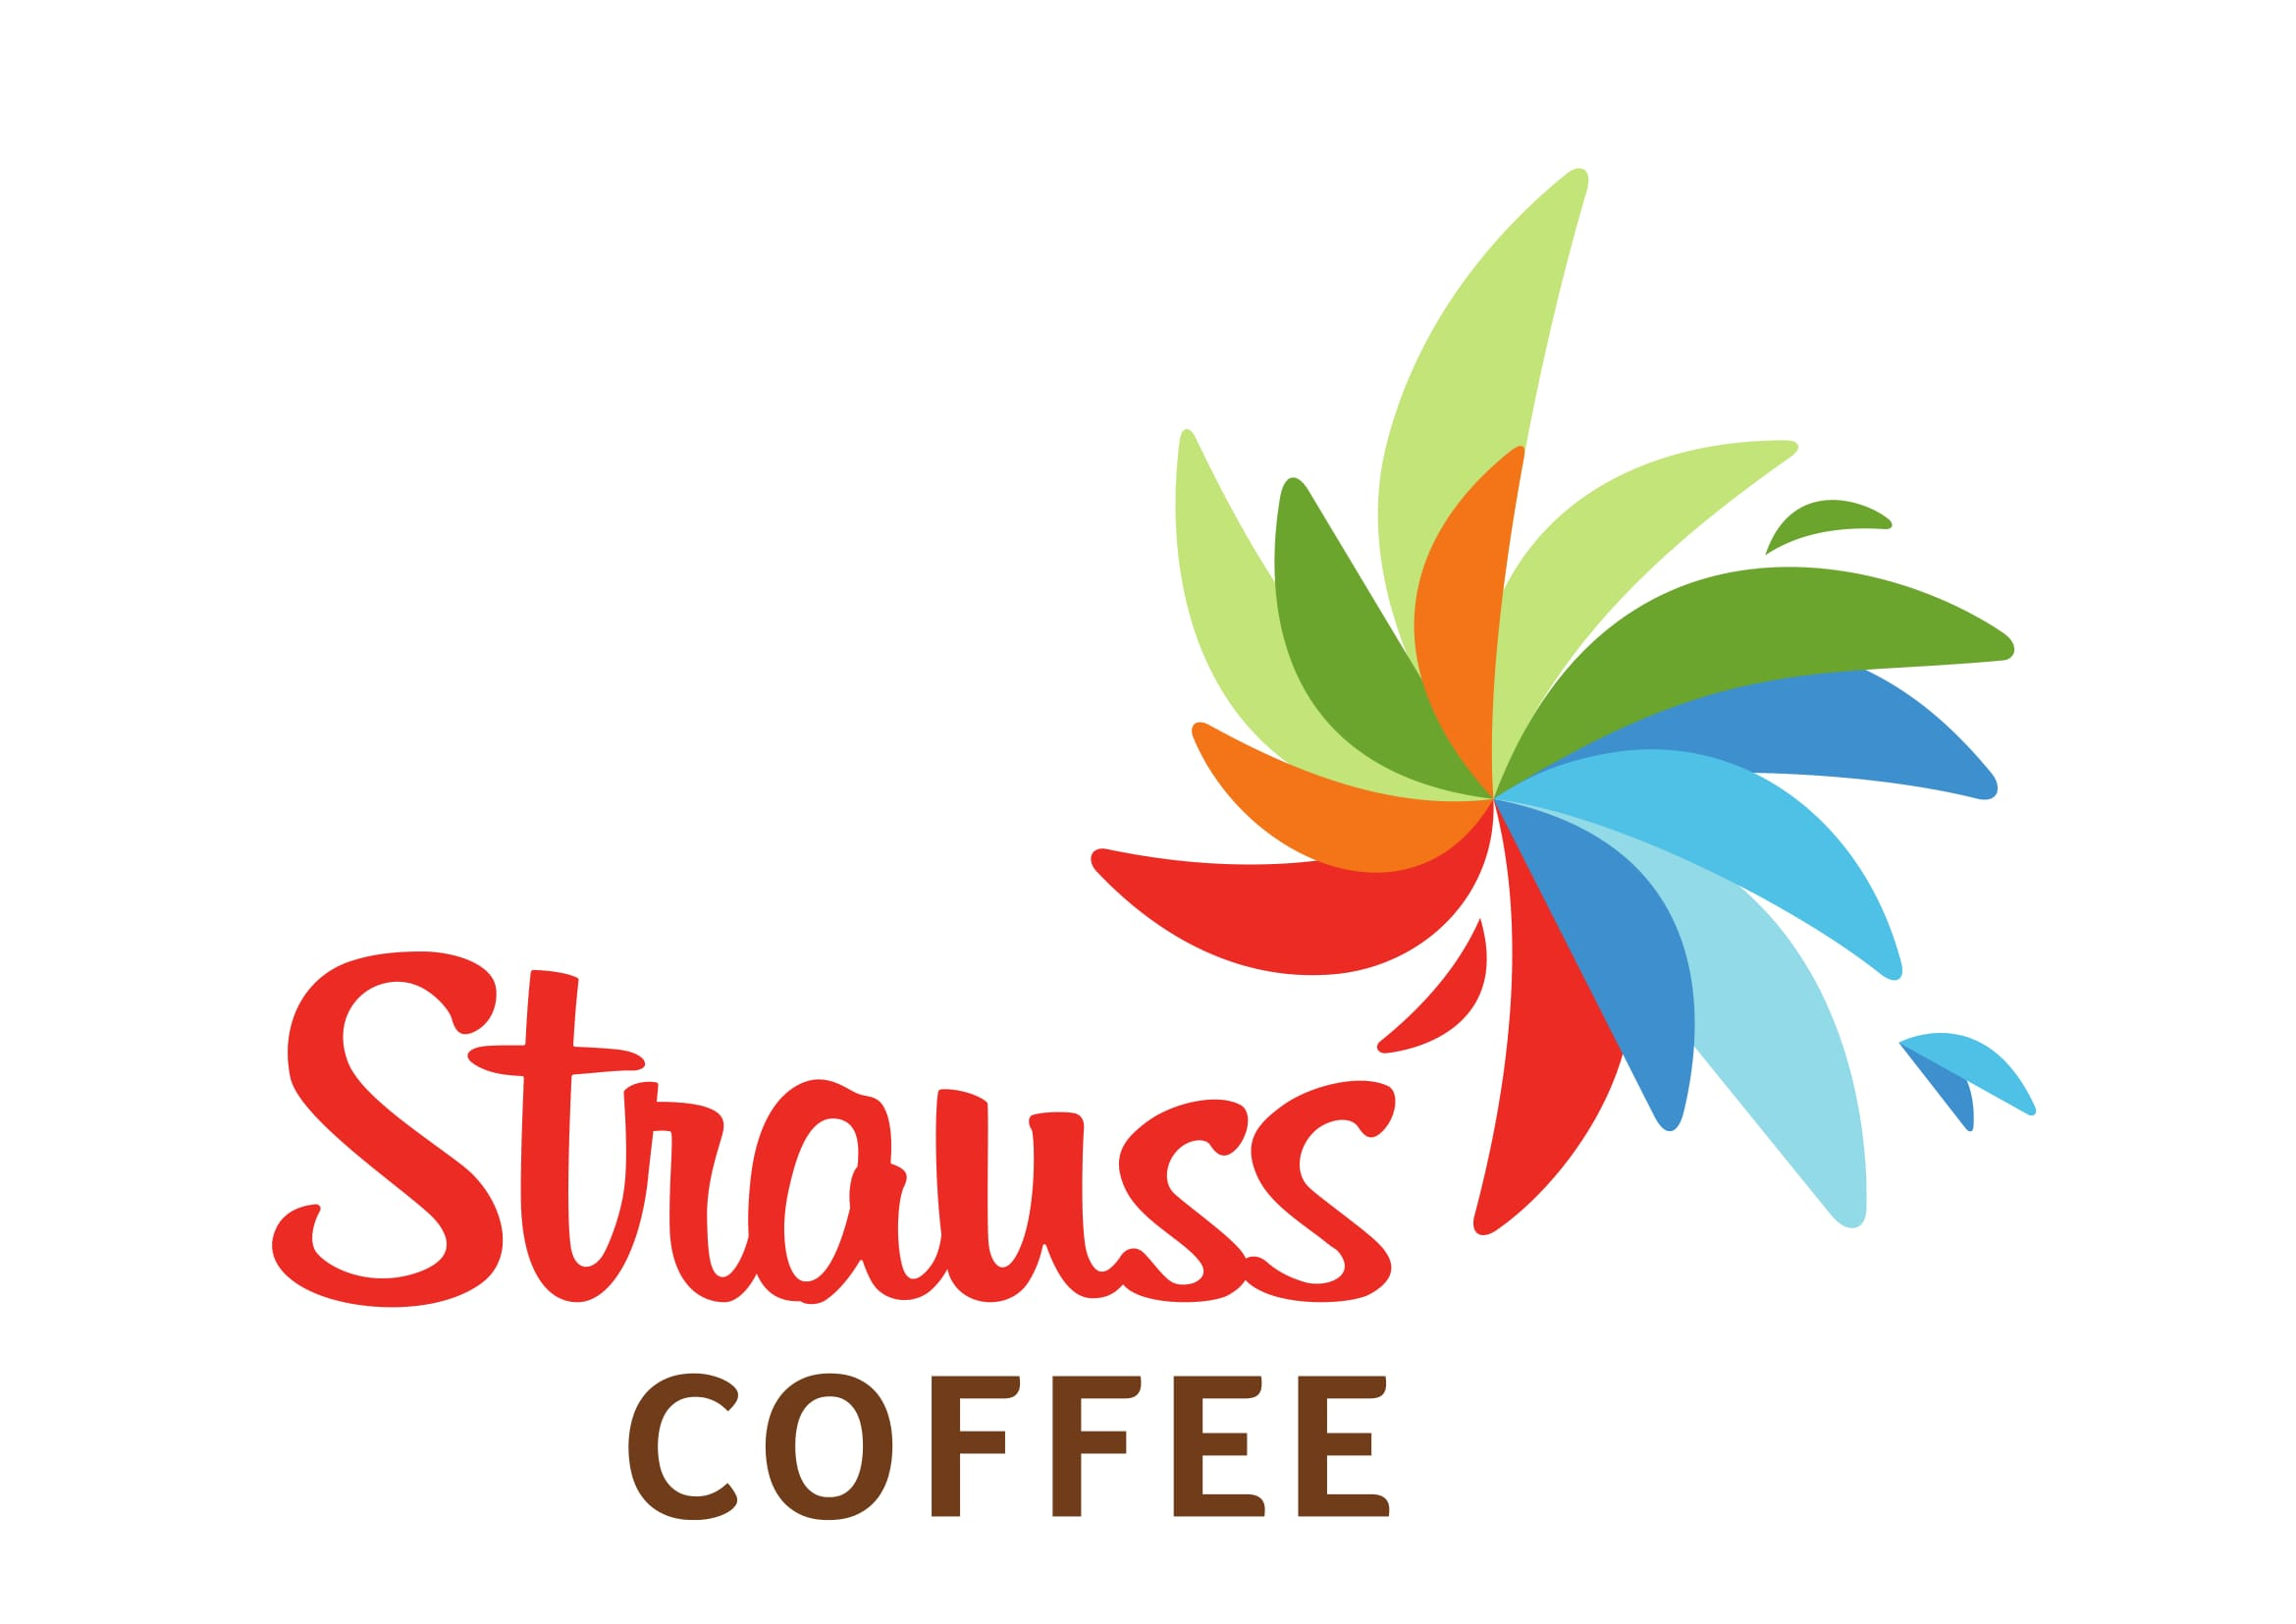 strauss_coffee-1.jpg